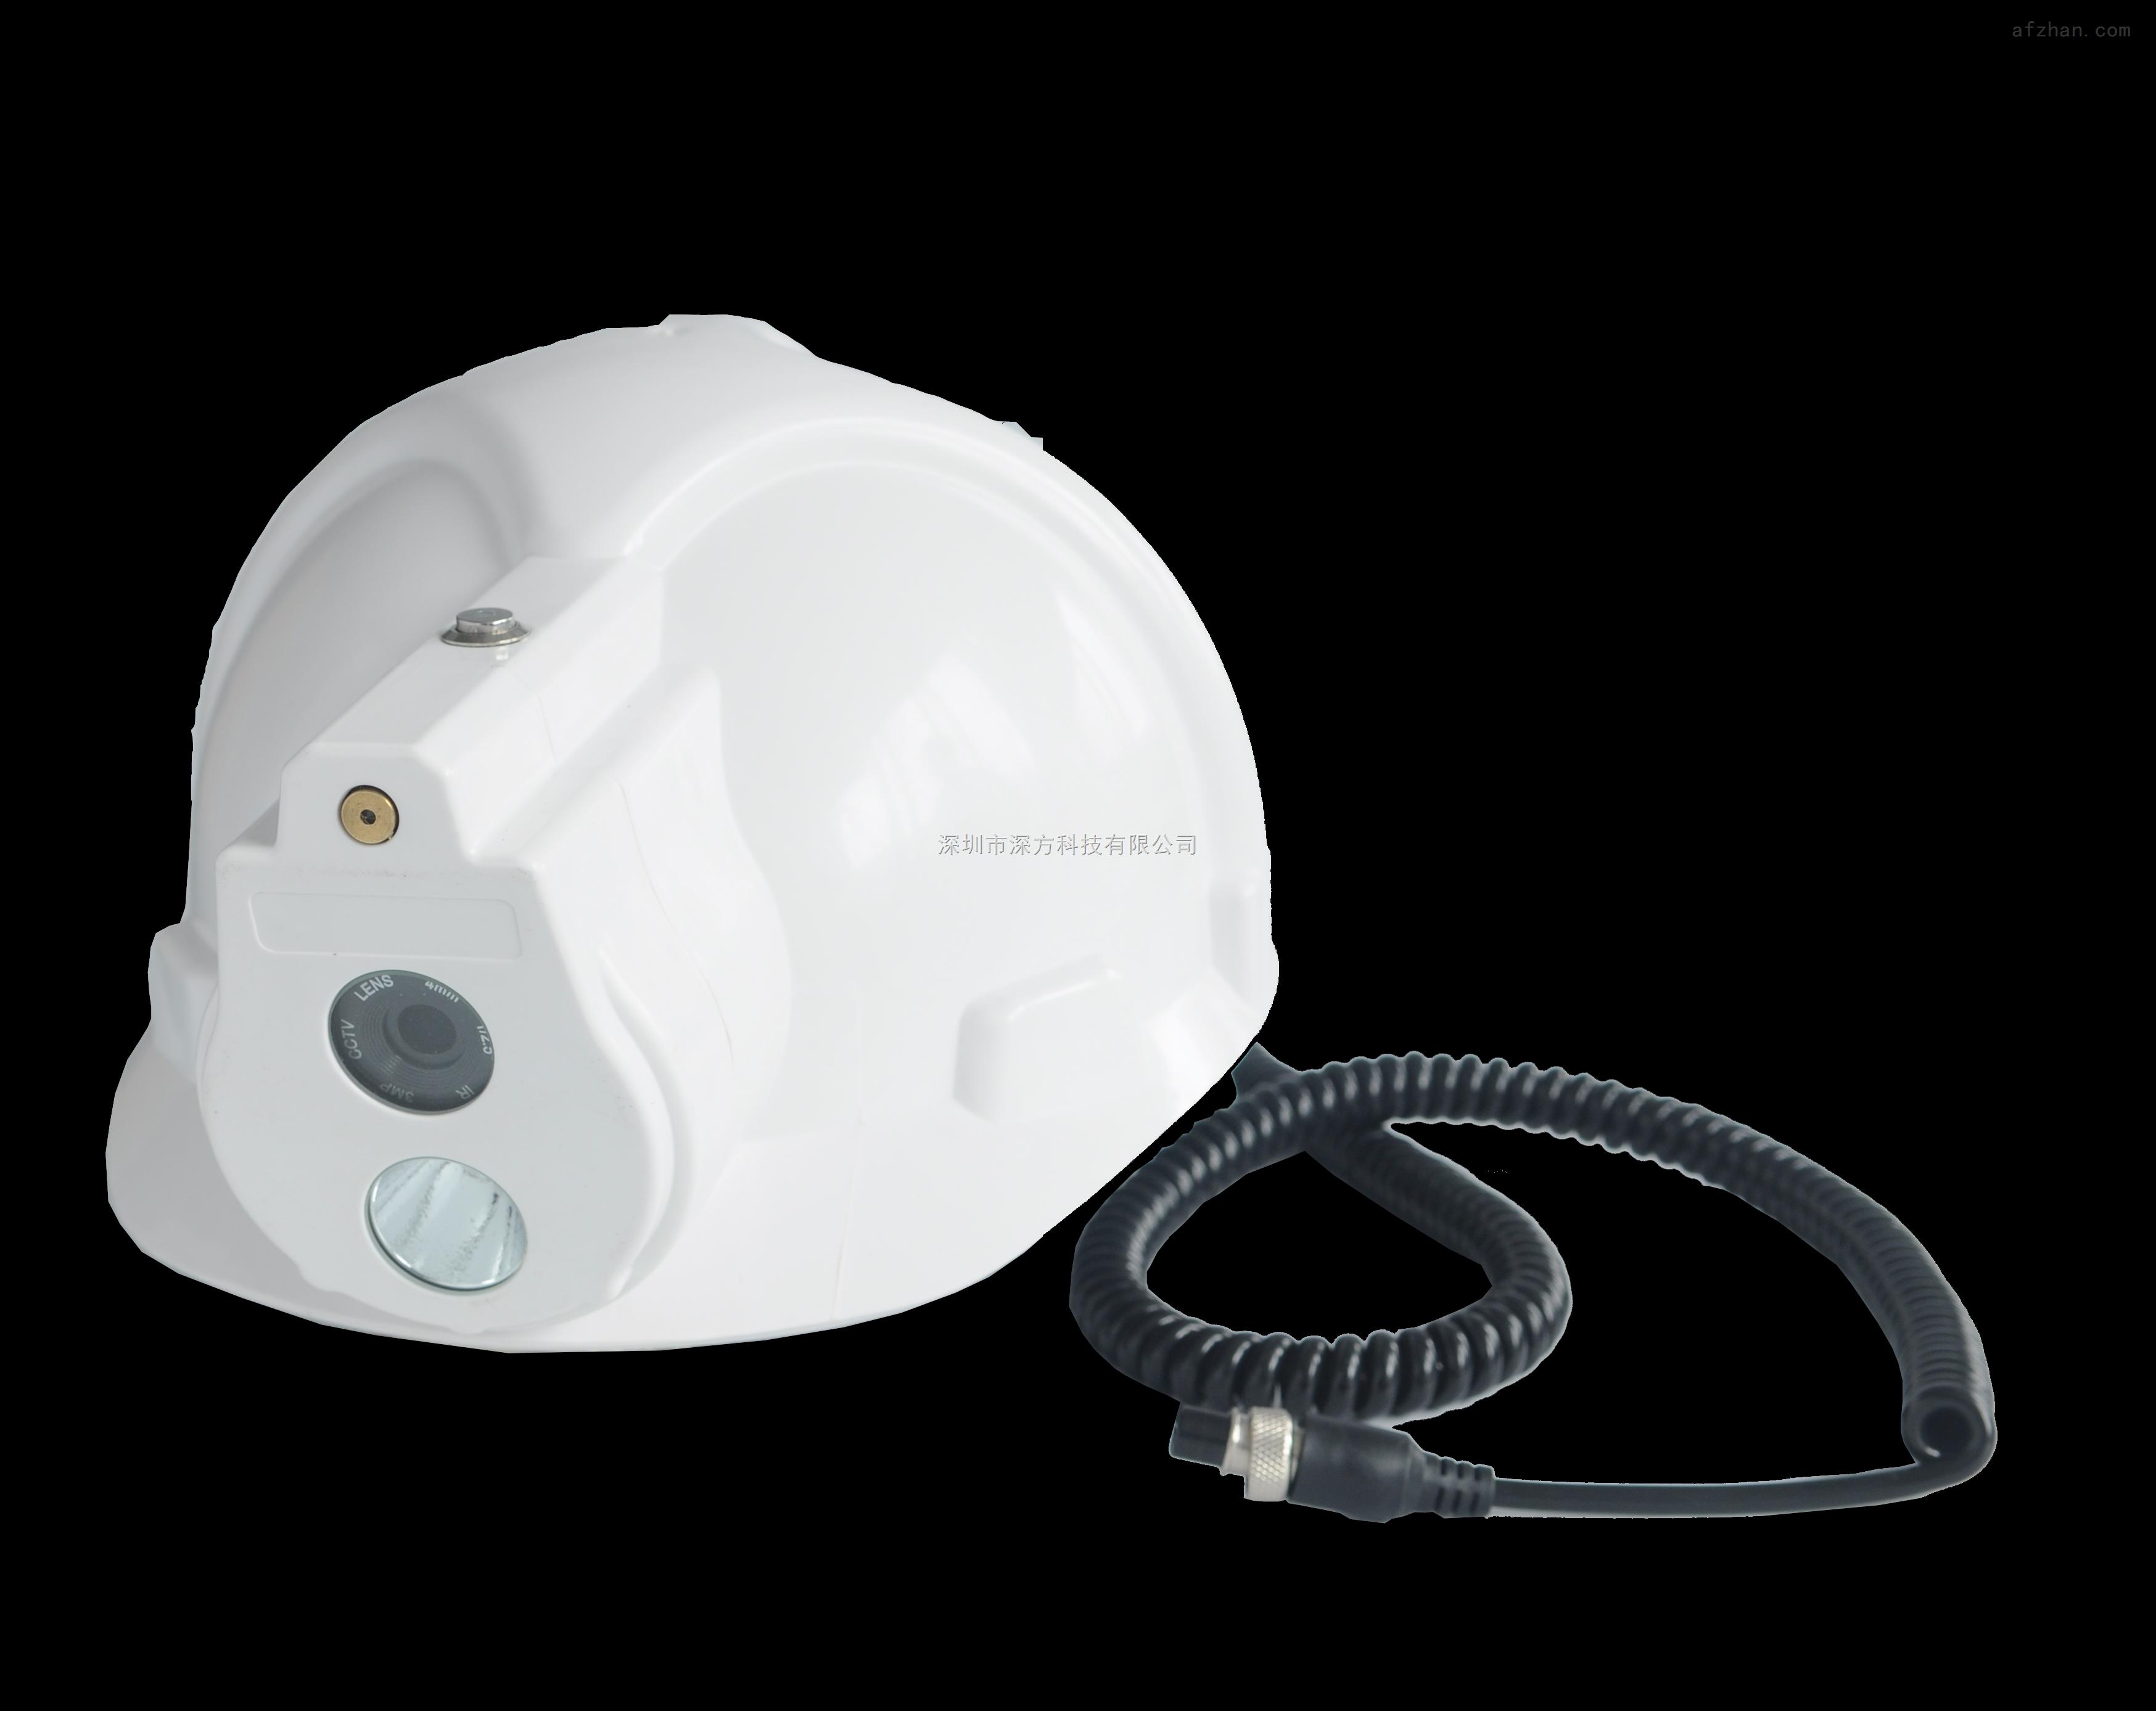 4G头盔无线传输设备,4G头盔,4G无线监控